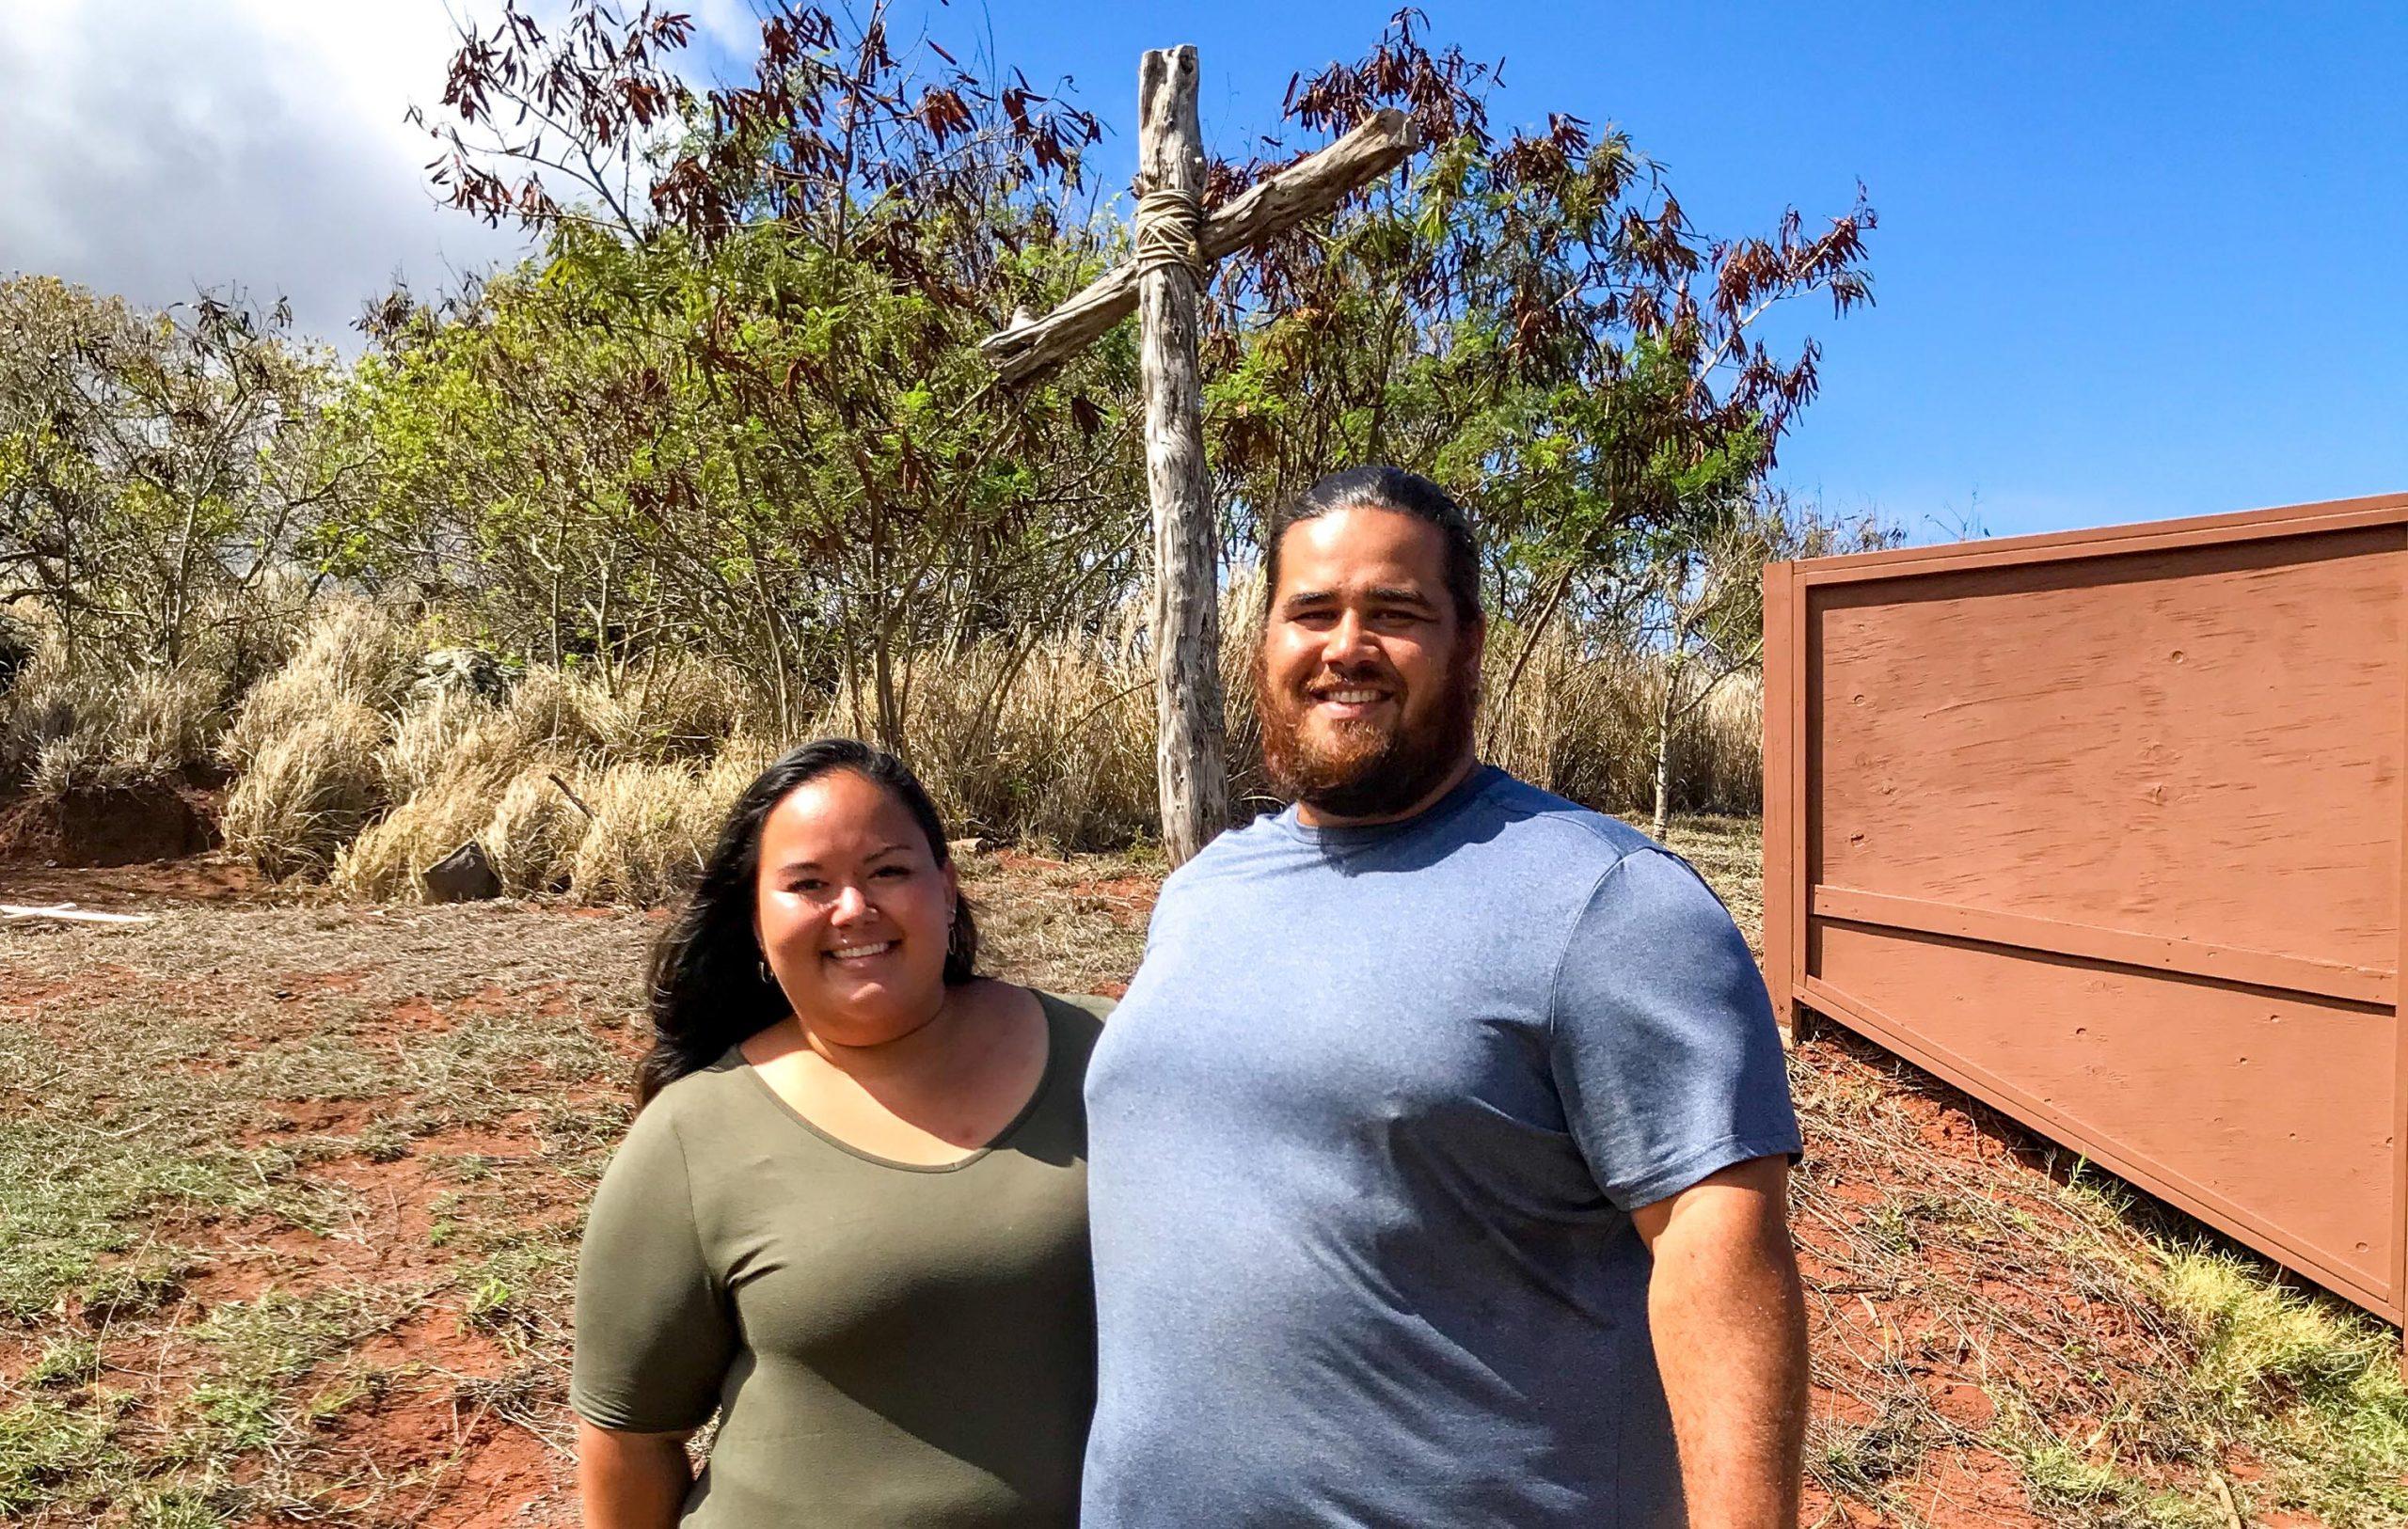 $75,000 Grant Providing 3 Molokaʻi Families with Roof, Bathroom & Even a New Home